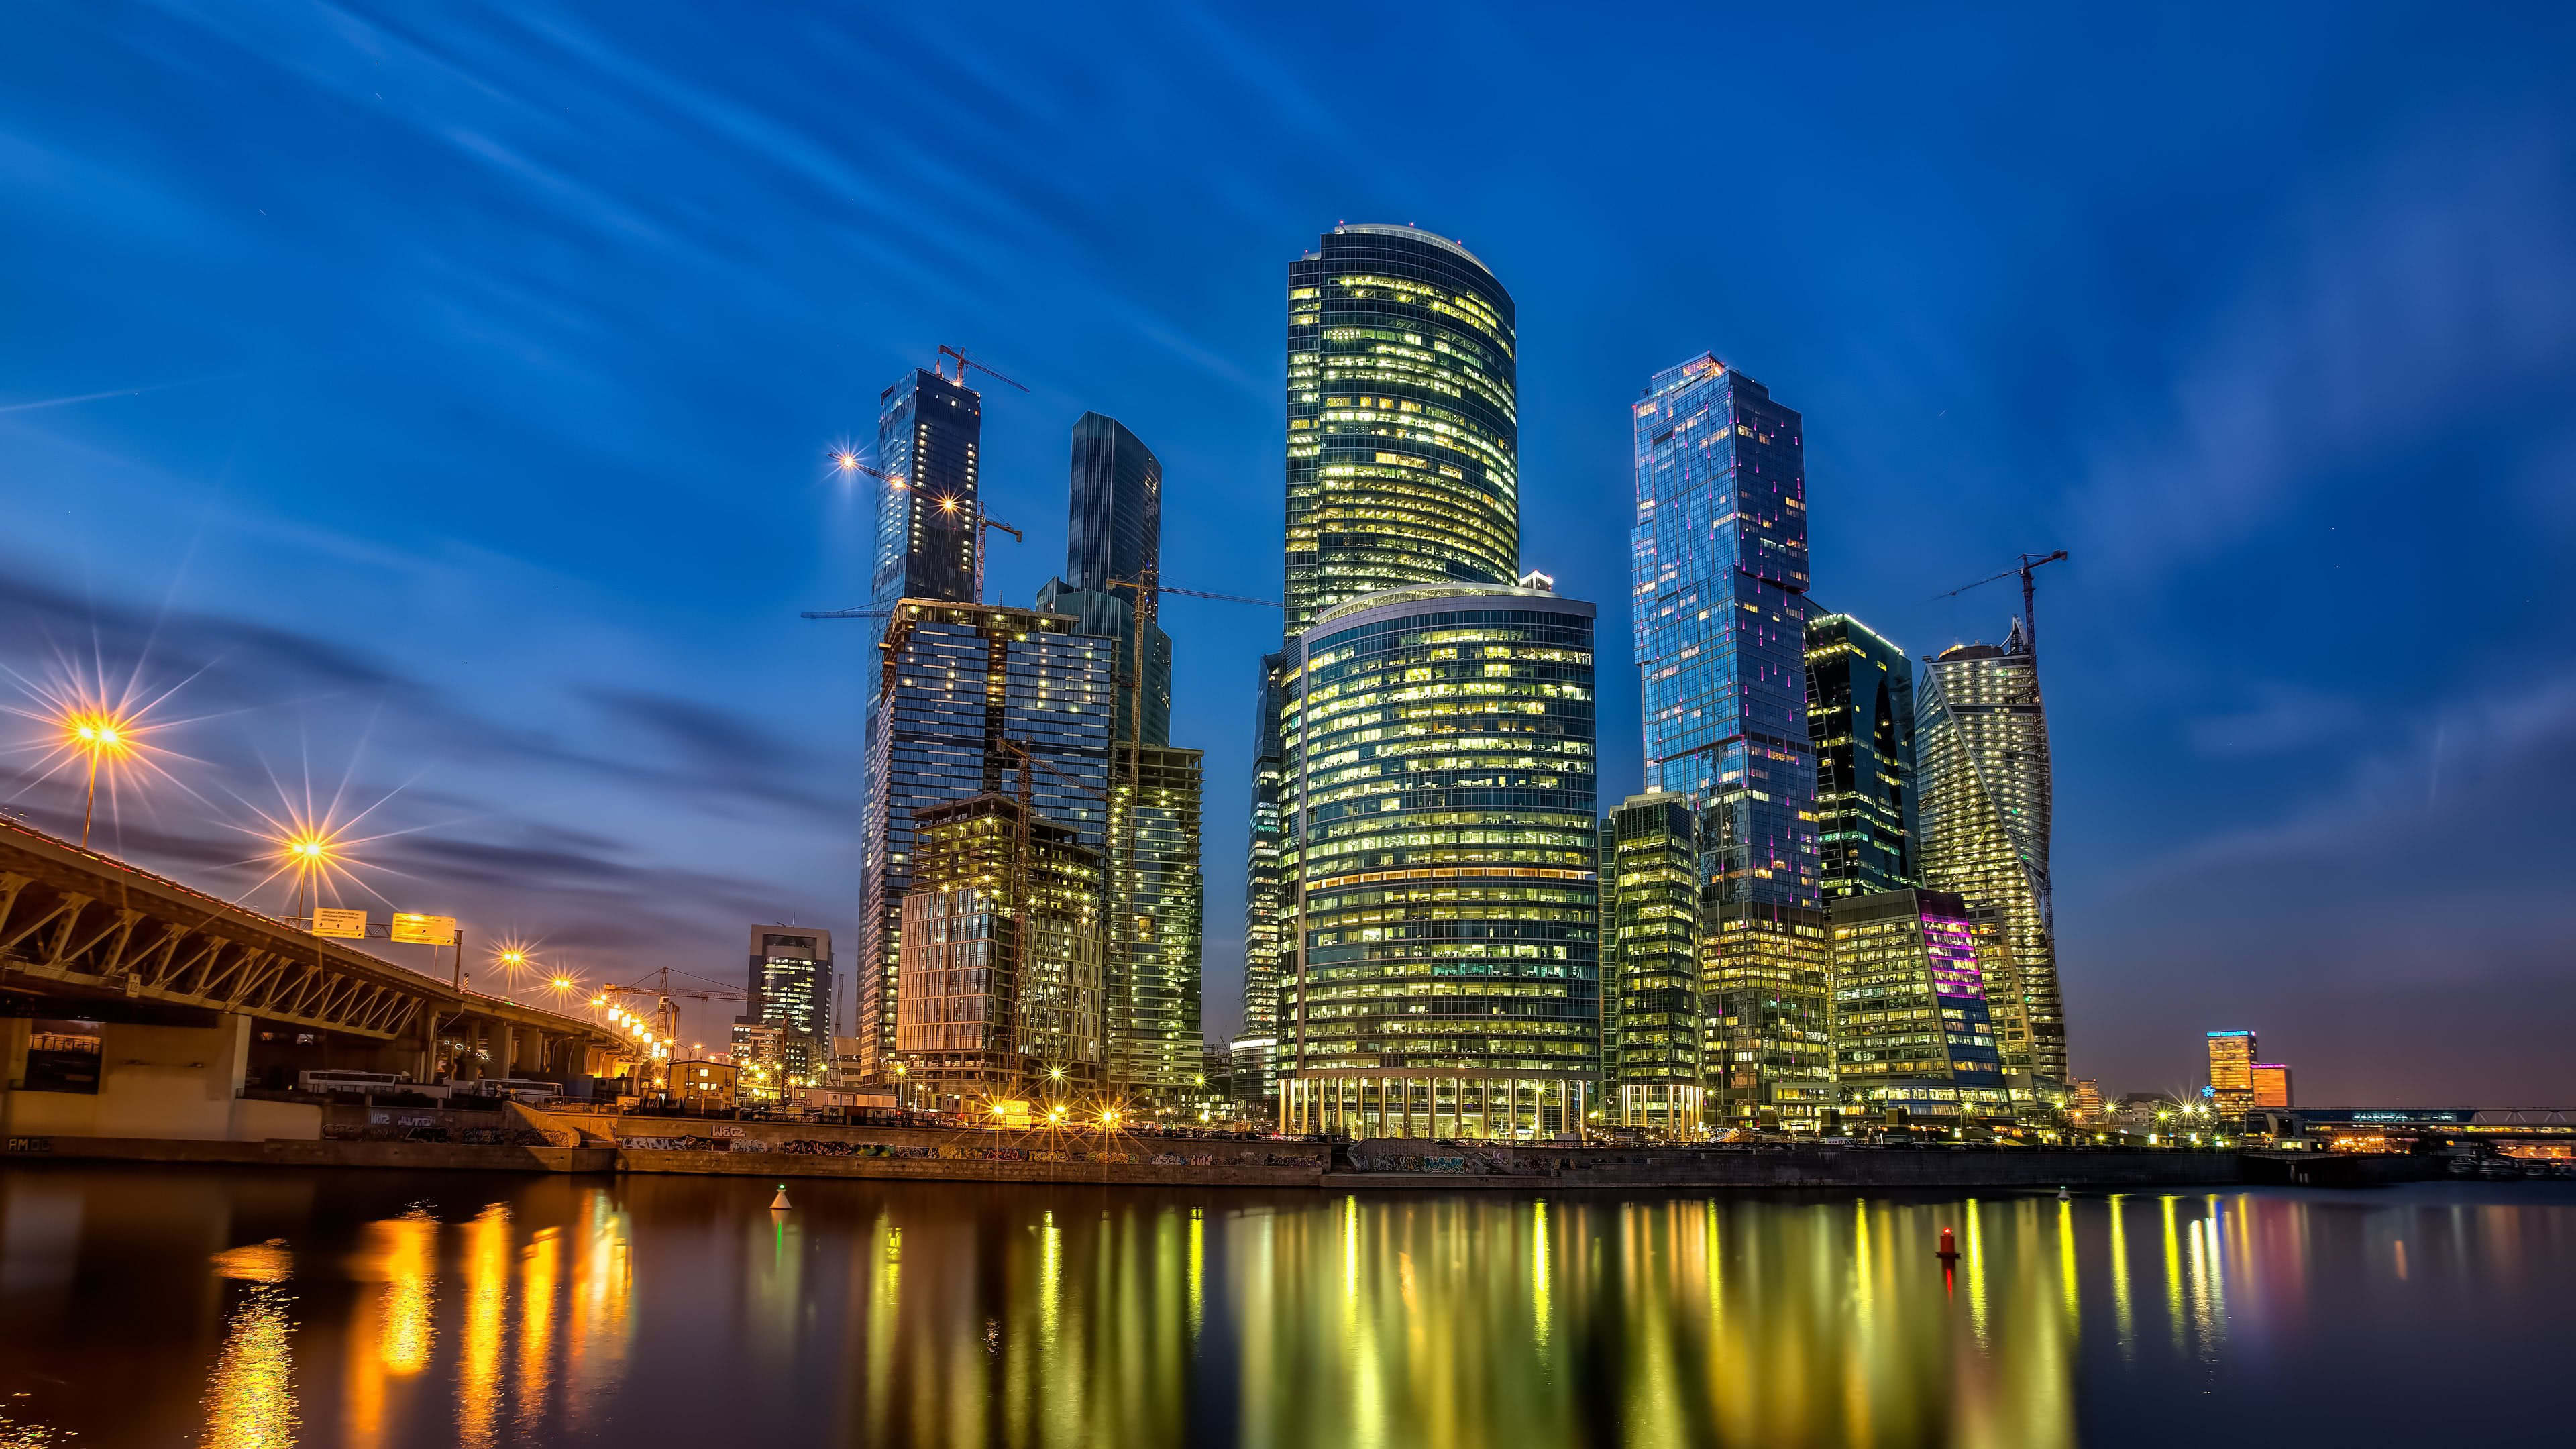 City Skyline Moscow Russia UHD 4K Wallpaper